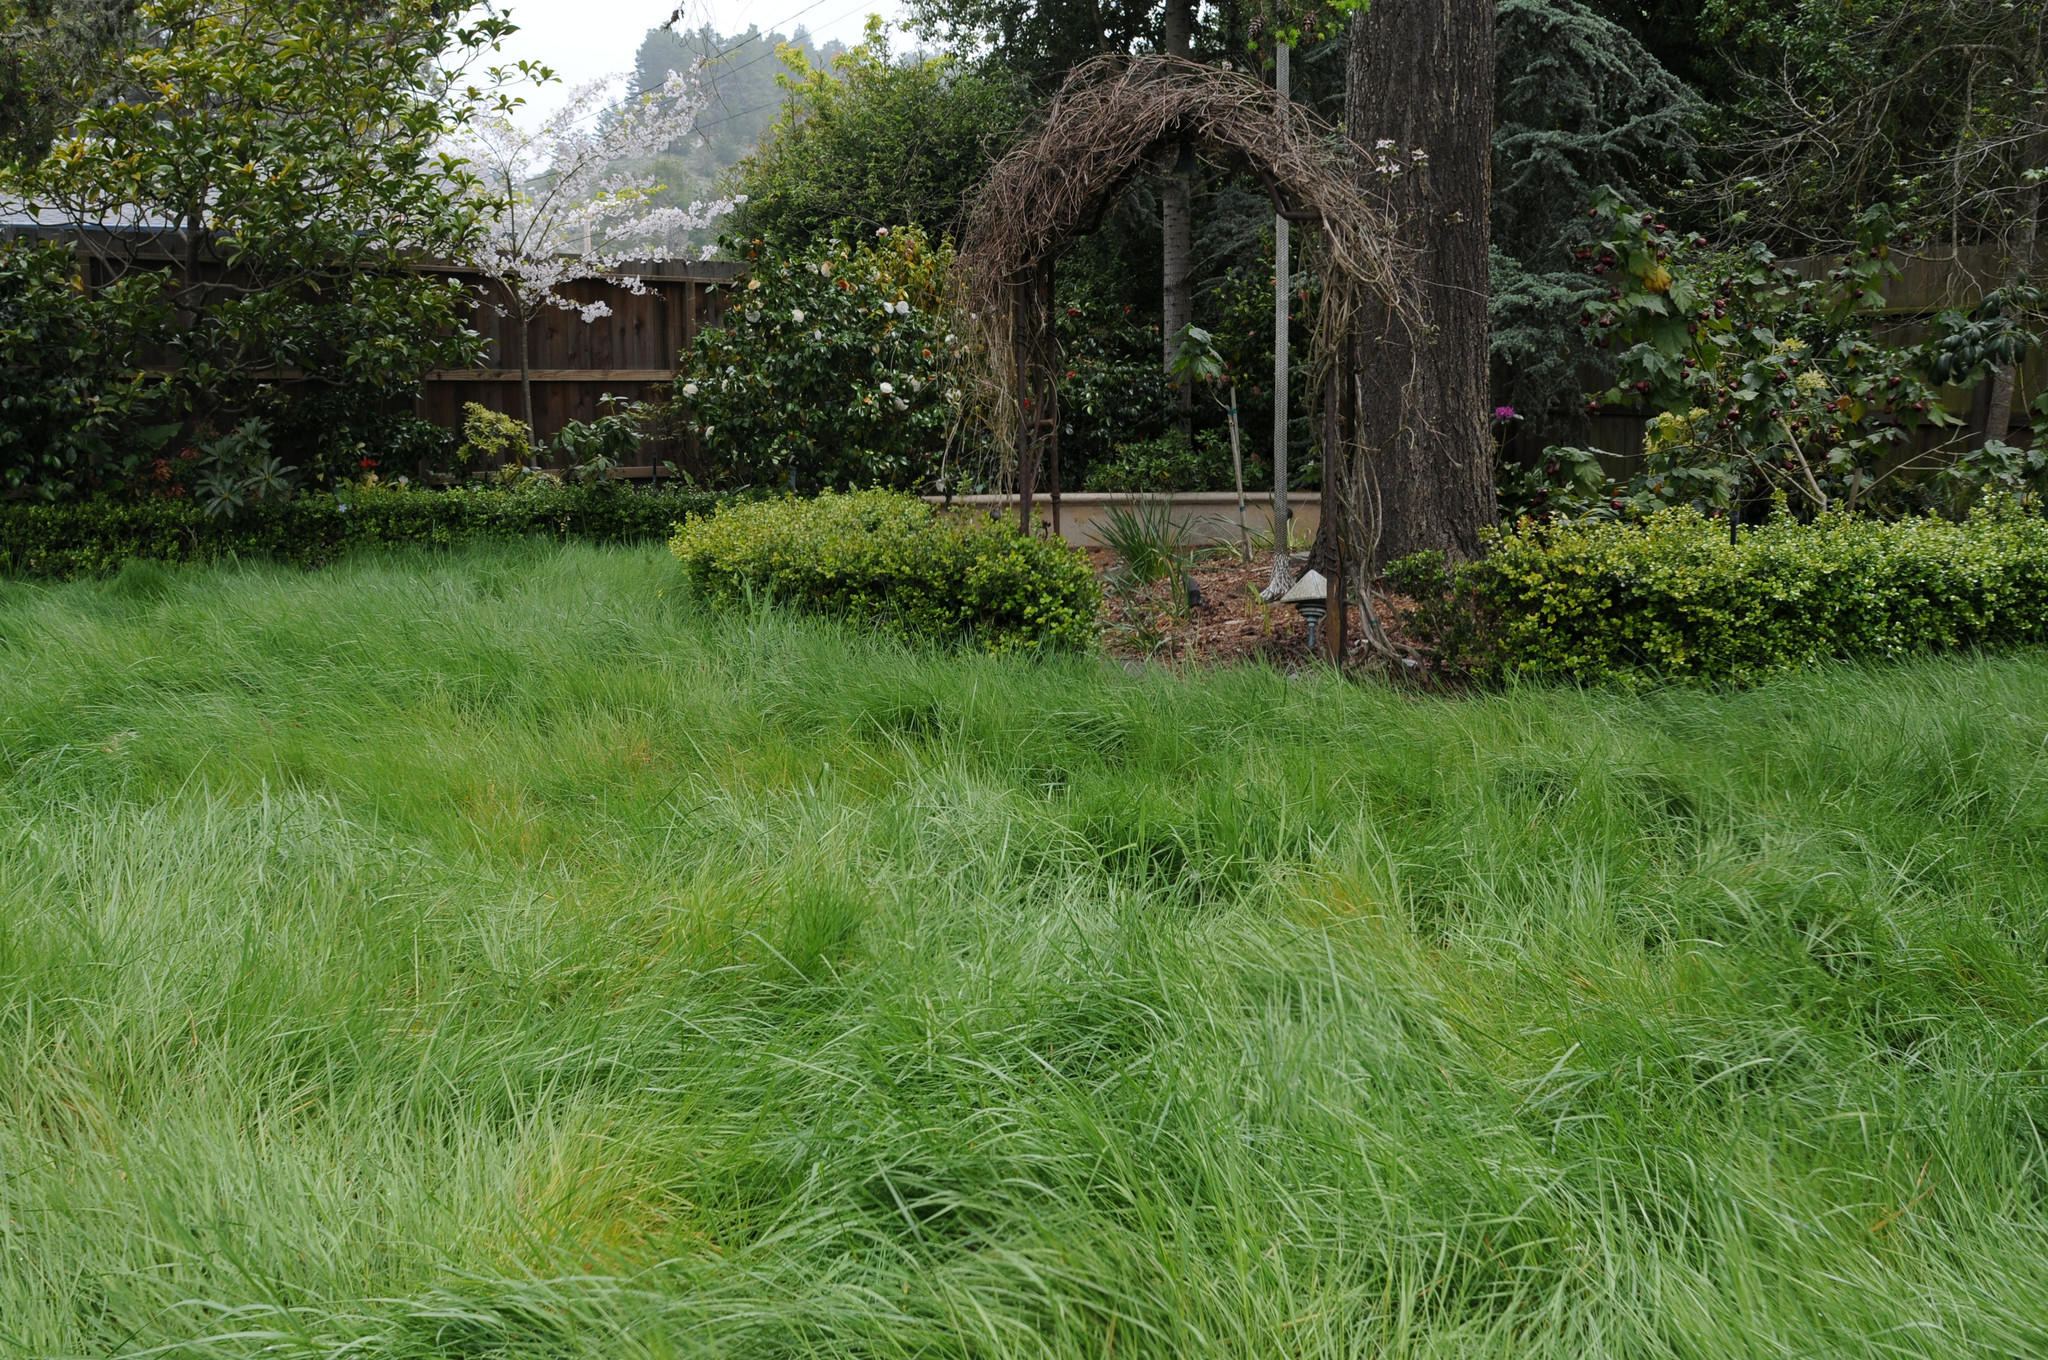 Native California bent grass